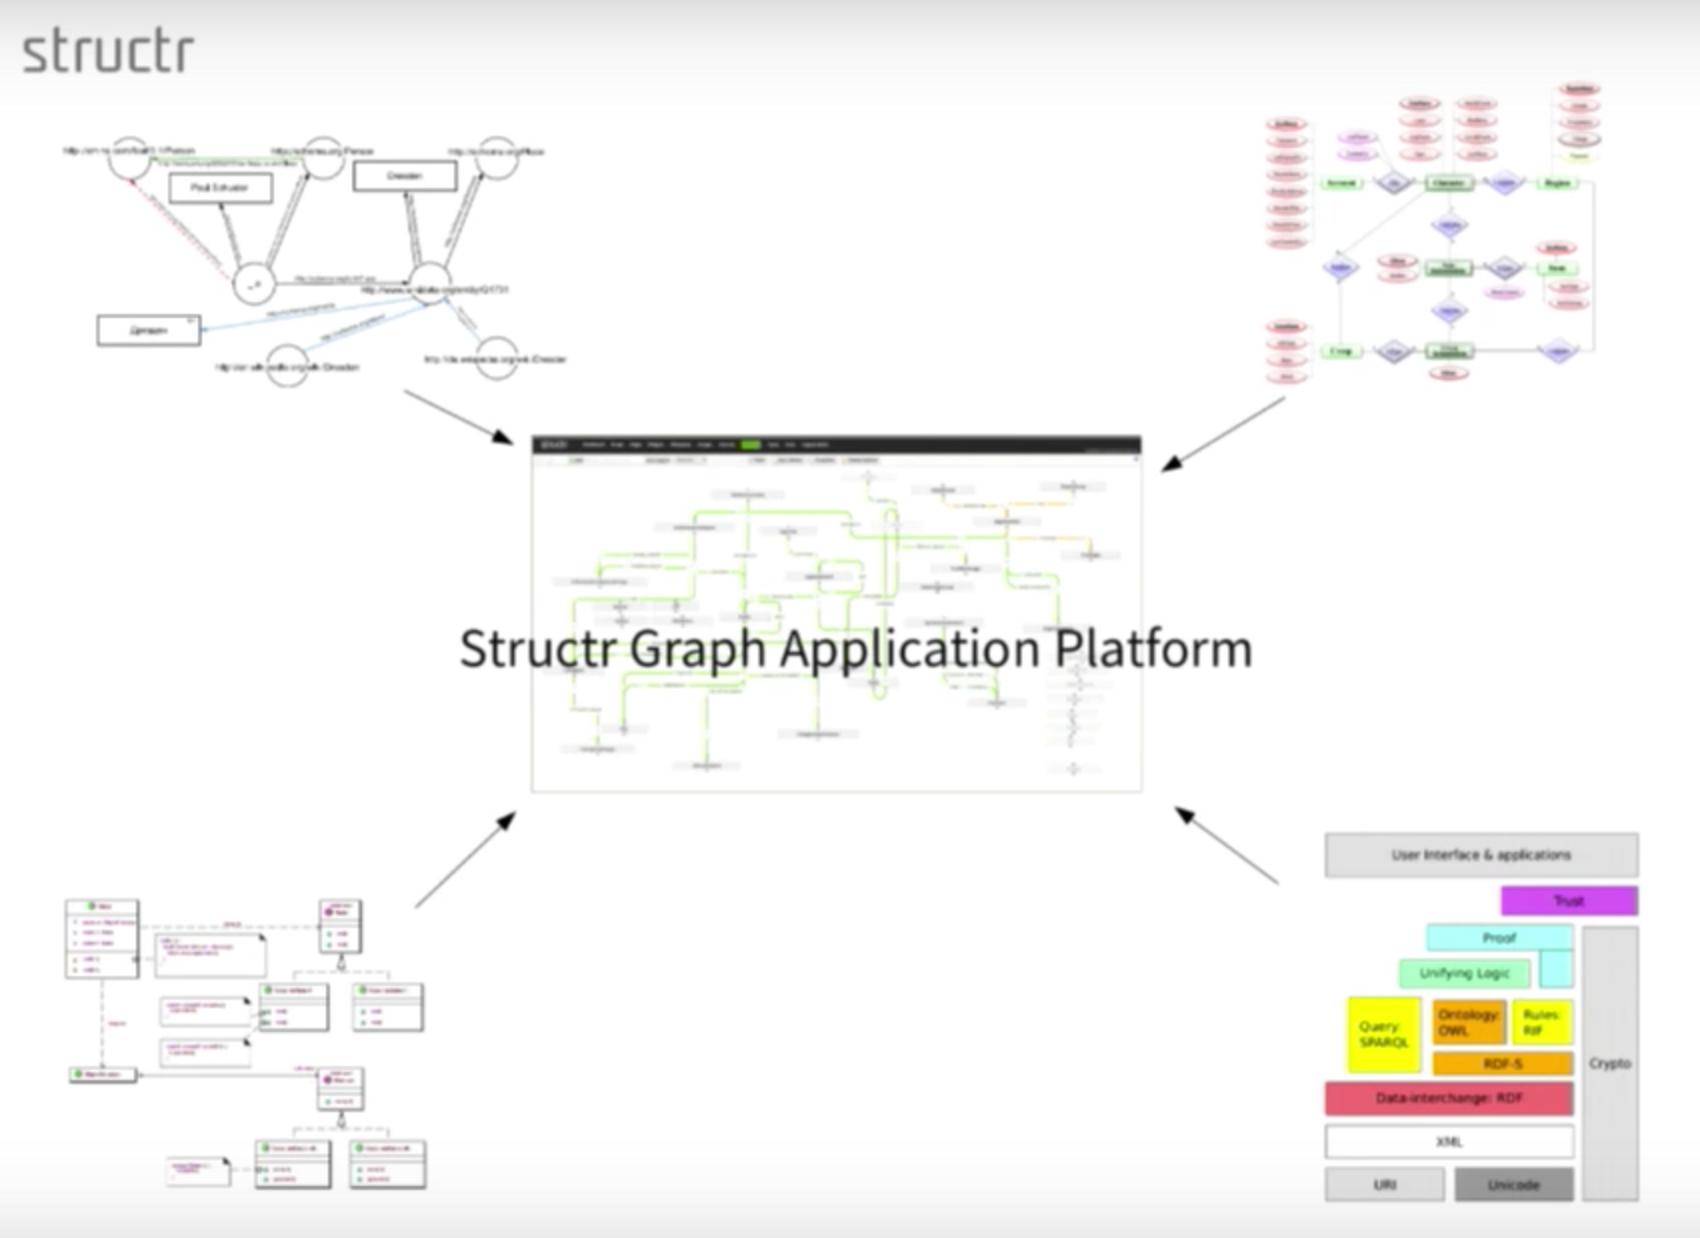 Enterprise Data Management With Graphs pertaining to Data Management Diagram